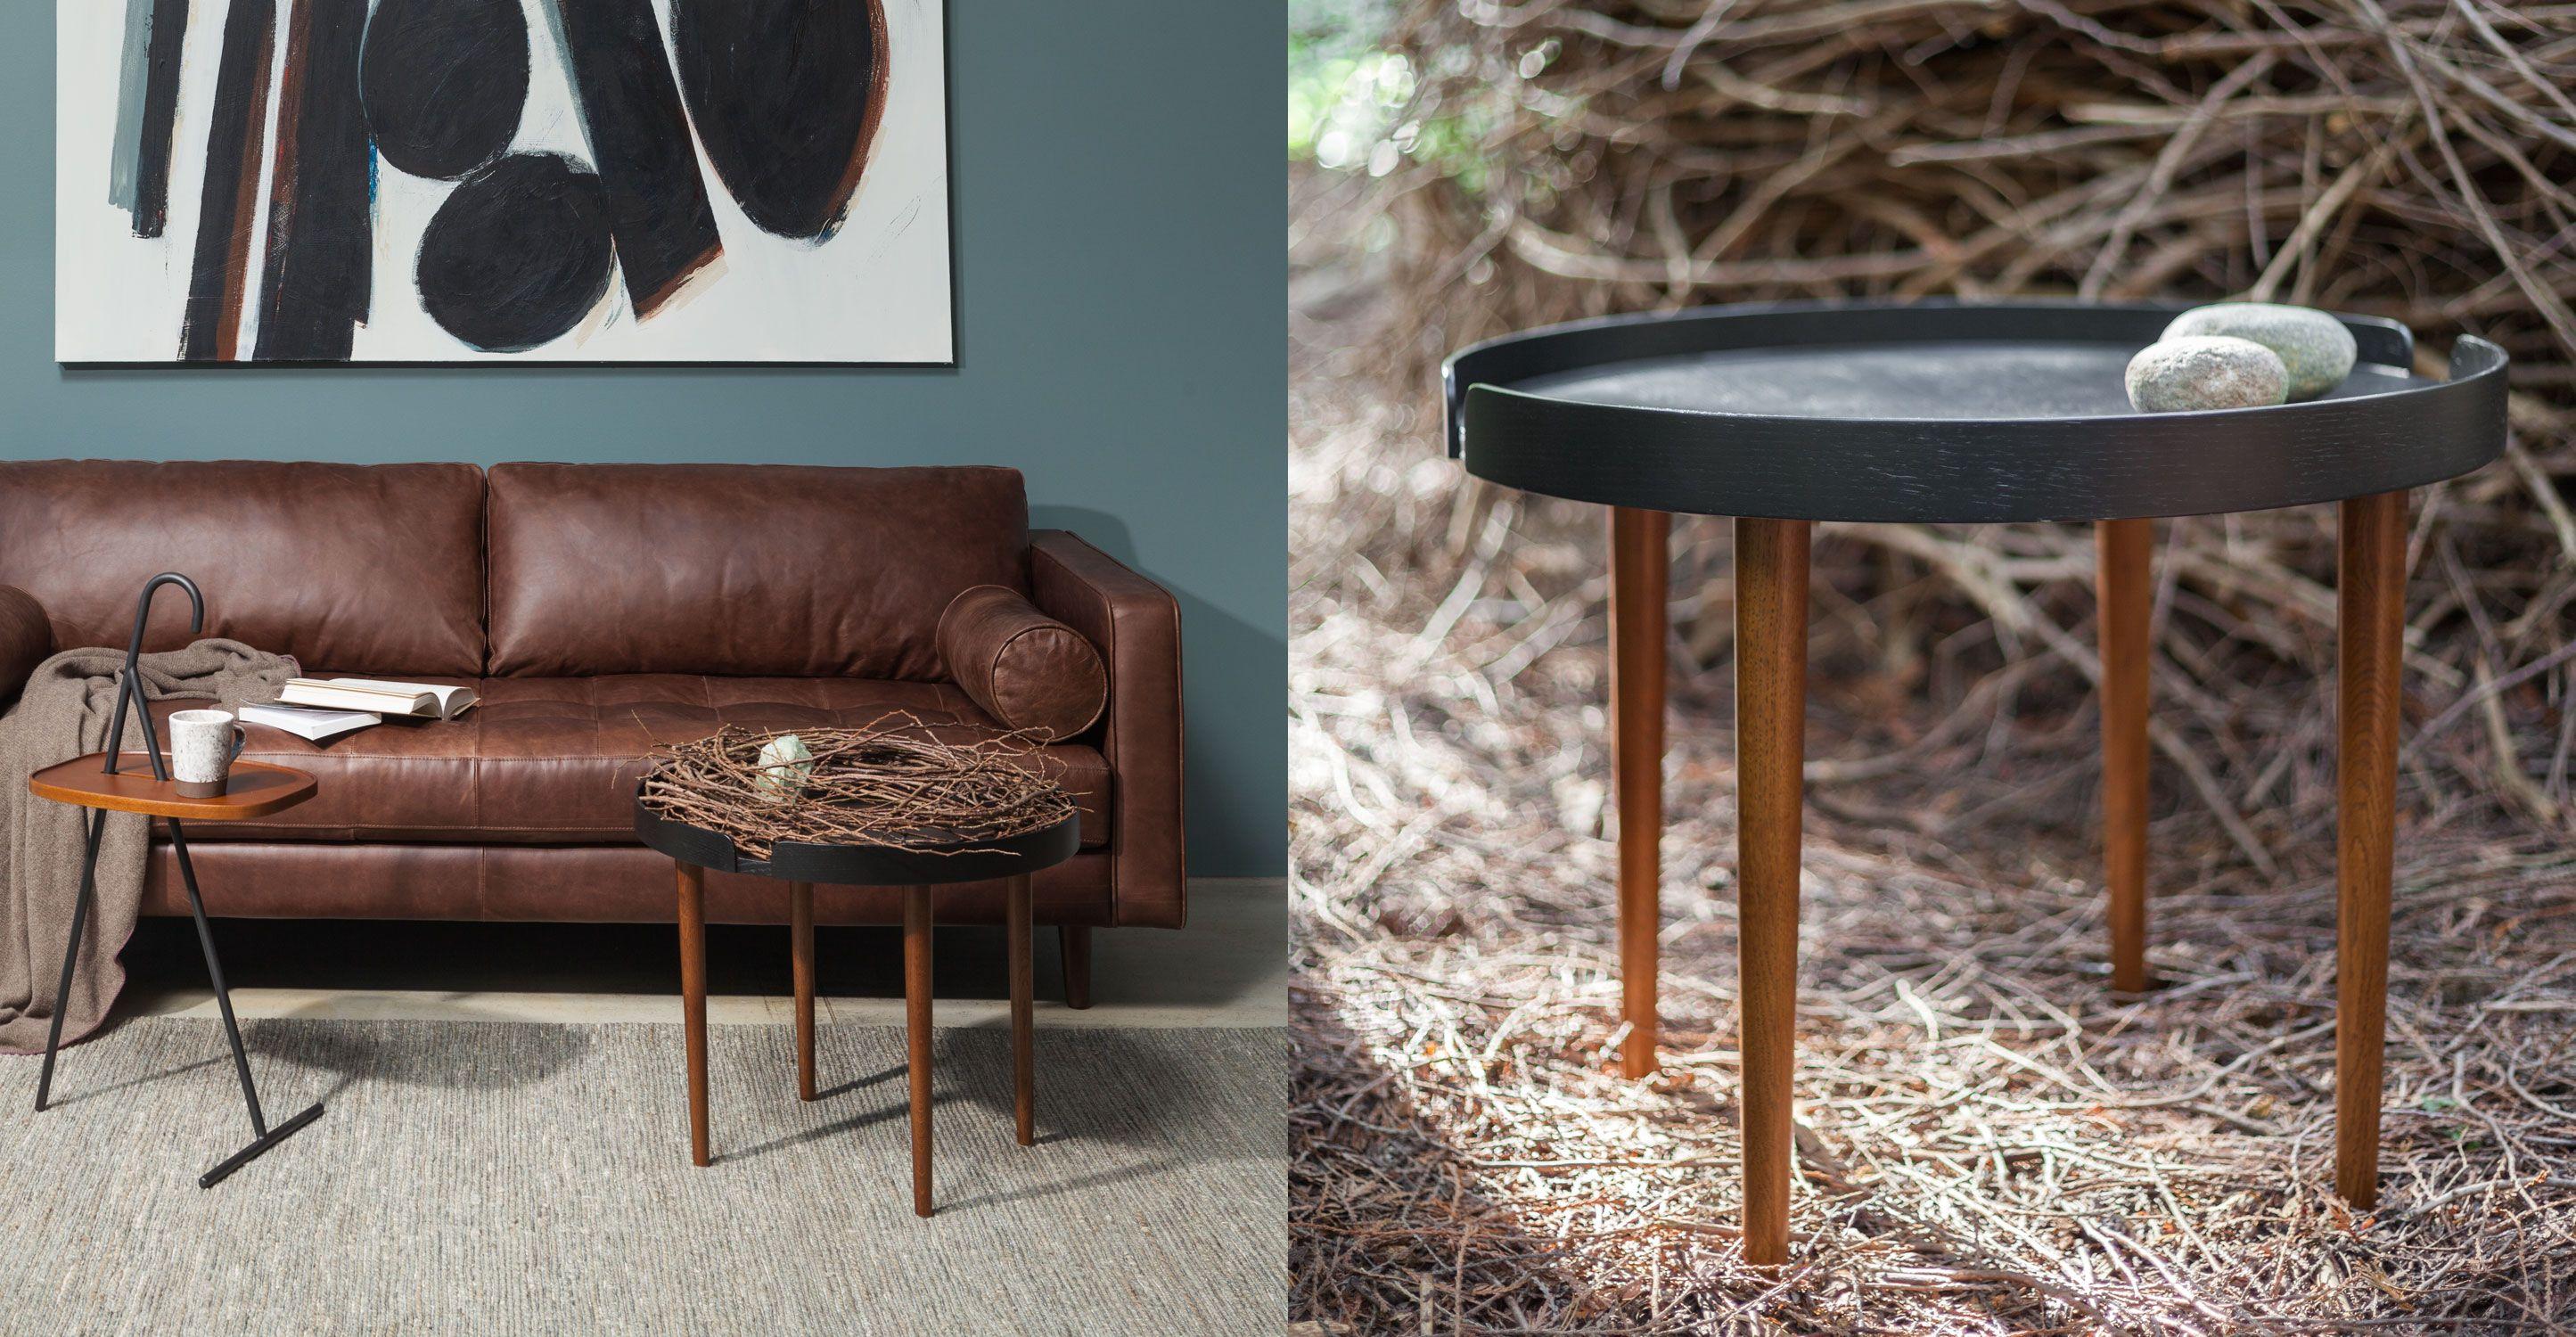 Trei Black X2f Walnut Coffee Table Coffee Table Mid Century Modern Coffee Table Walnut Coffee Table [ 1500 x 2890 Pixel ]